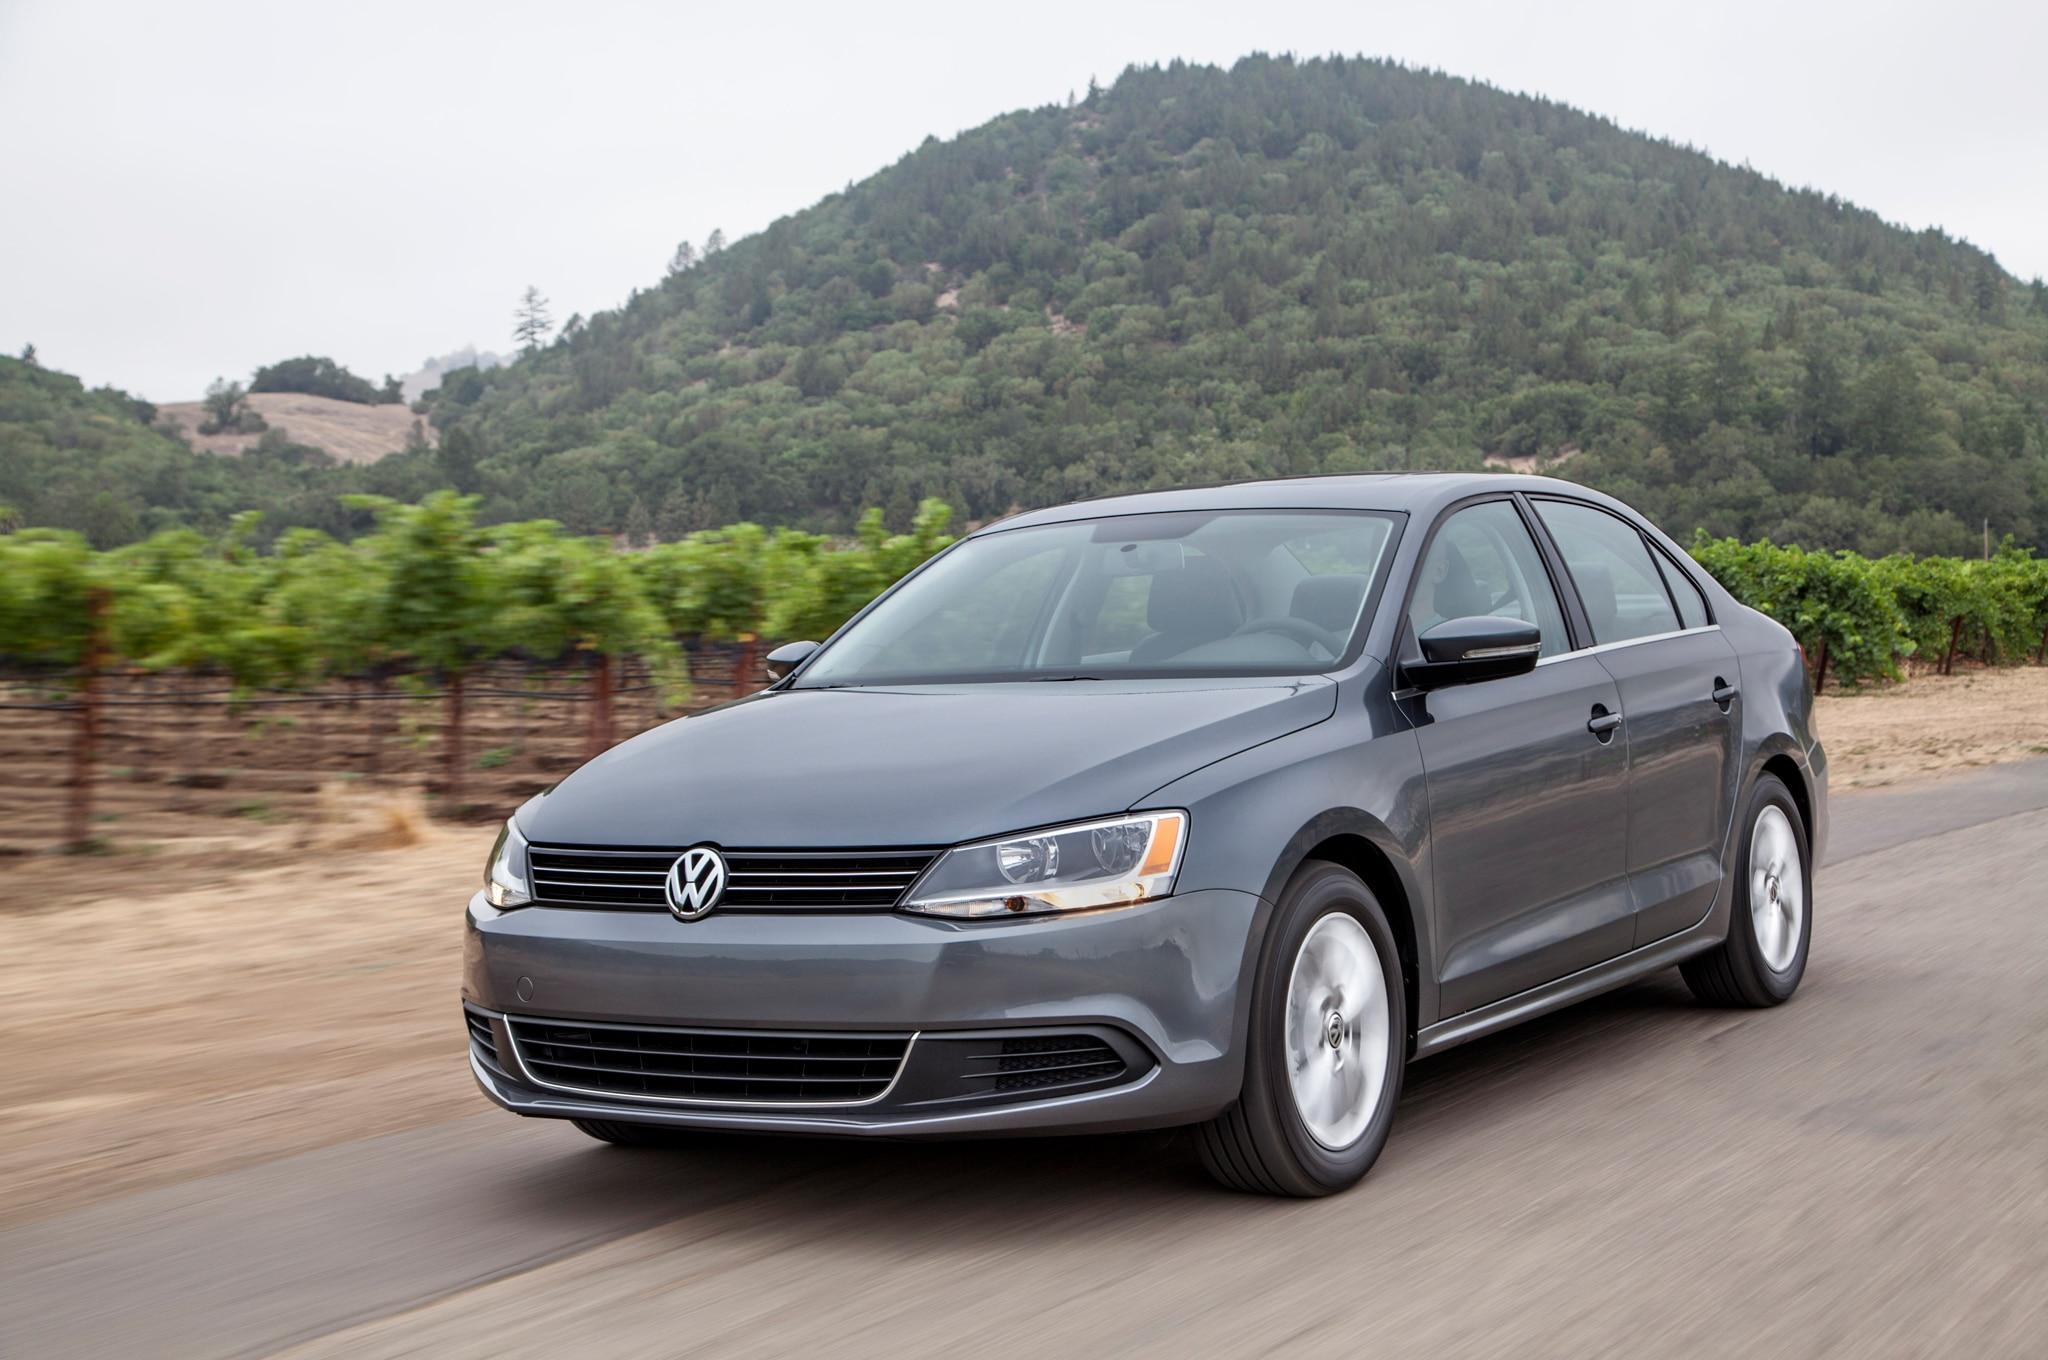 2014 Volkswagen Jetta Front Three Quarters1